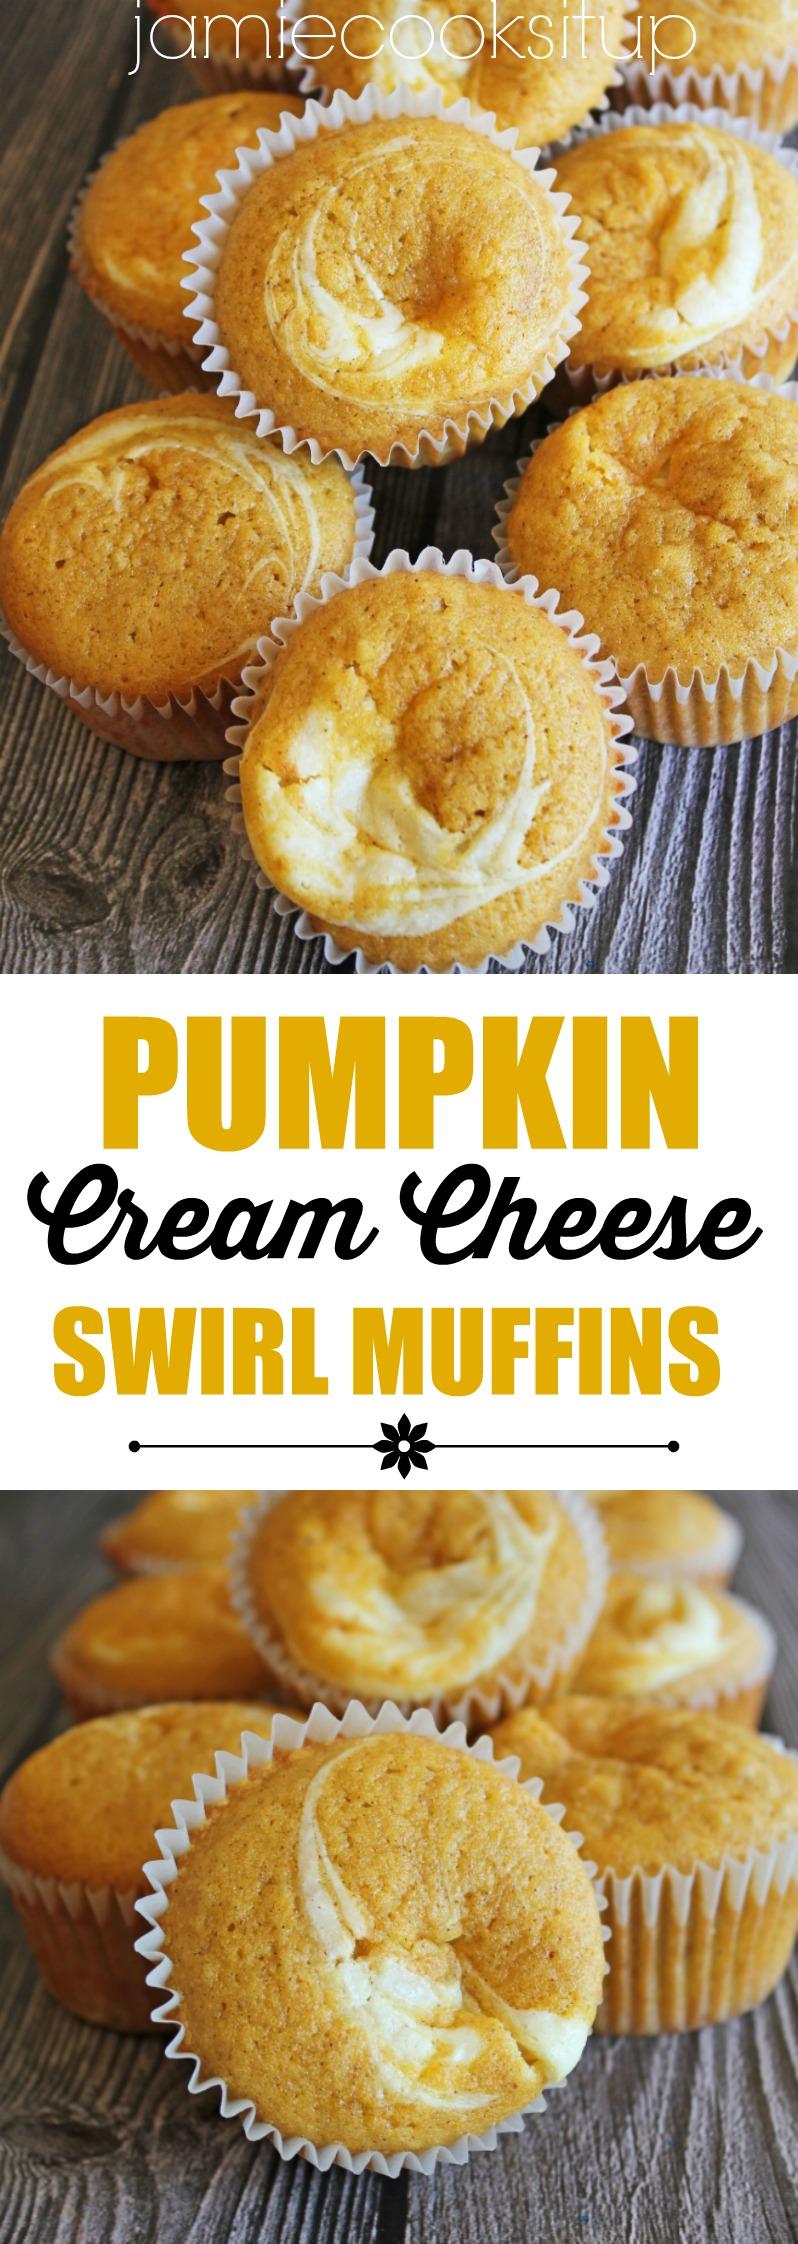 pumpkin-cream-cheese-swirl-muffins-from-jamie-cooks-it-up